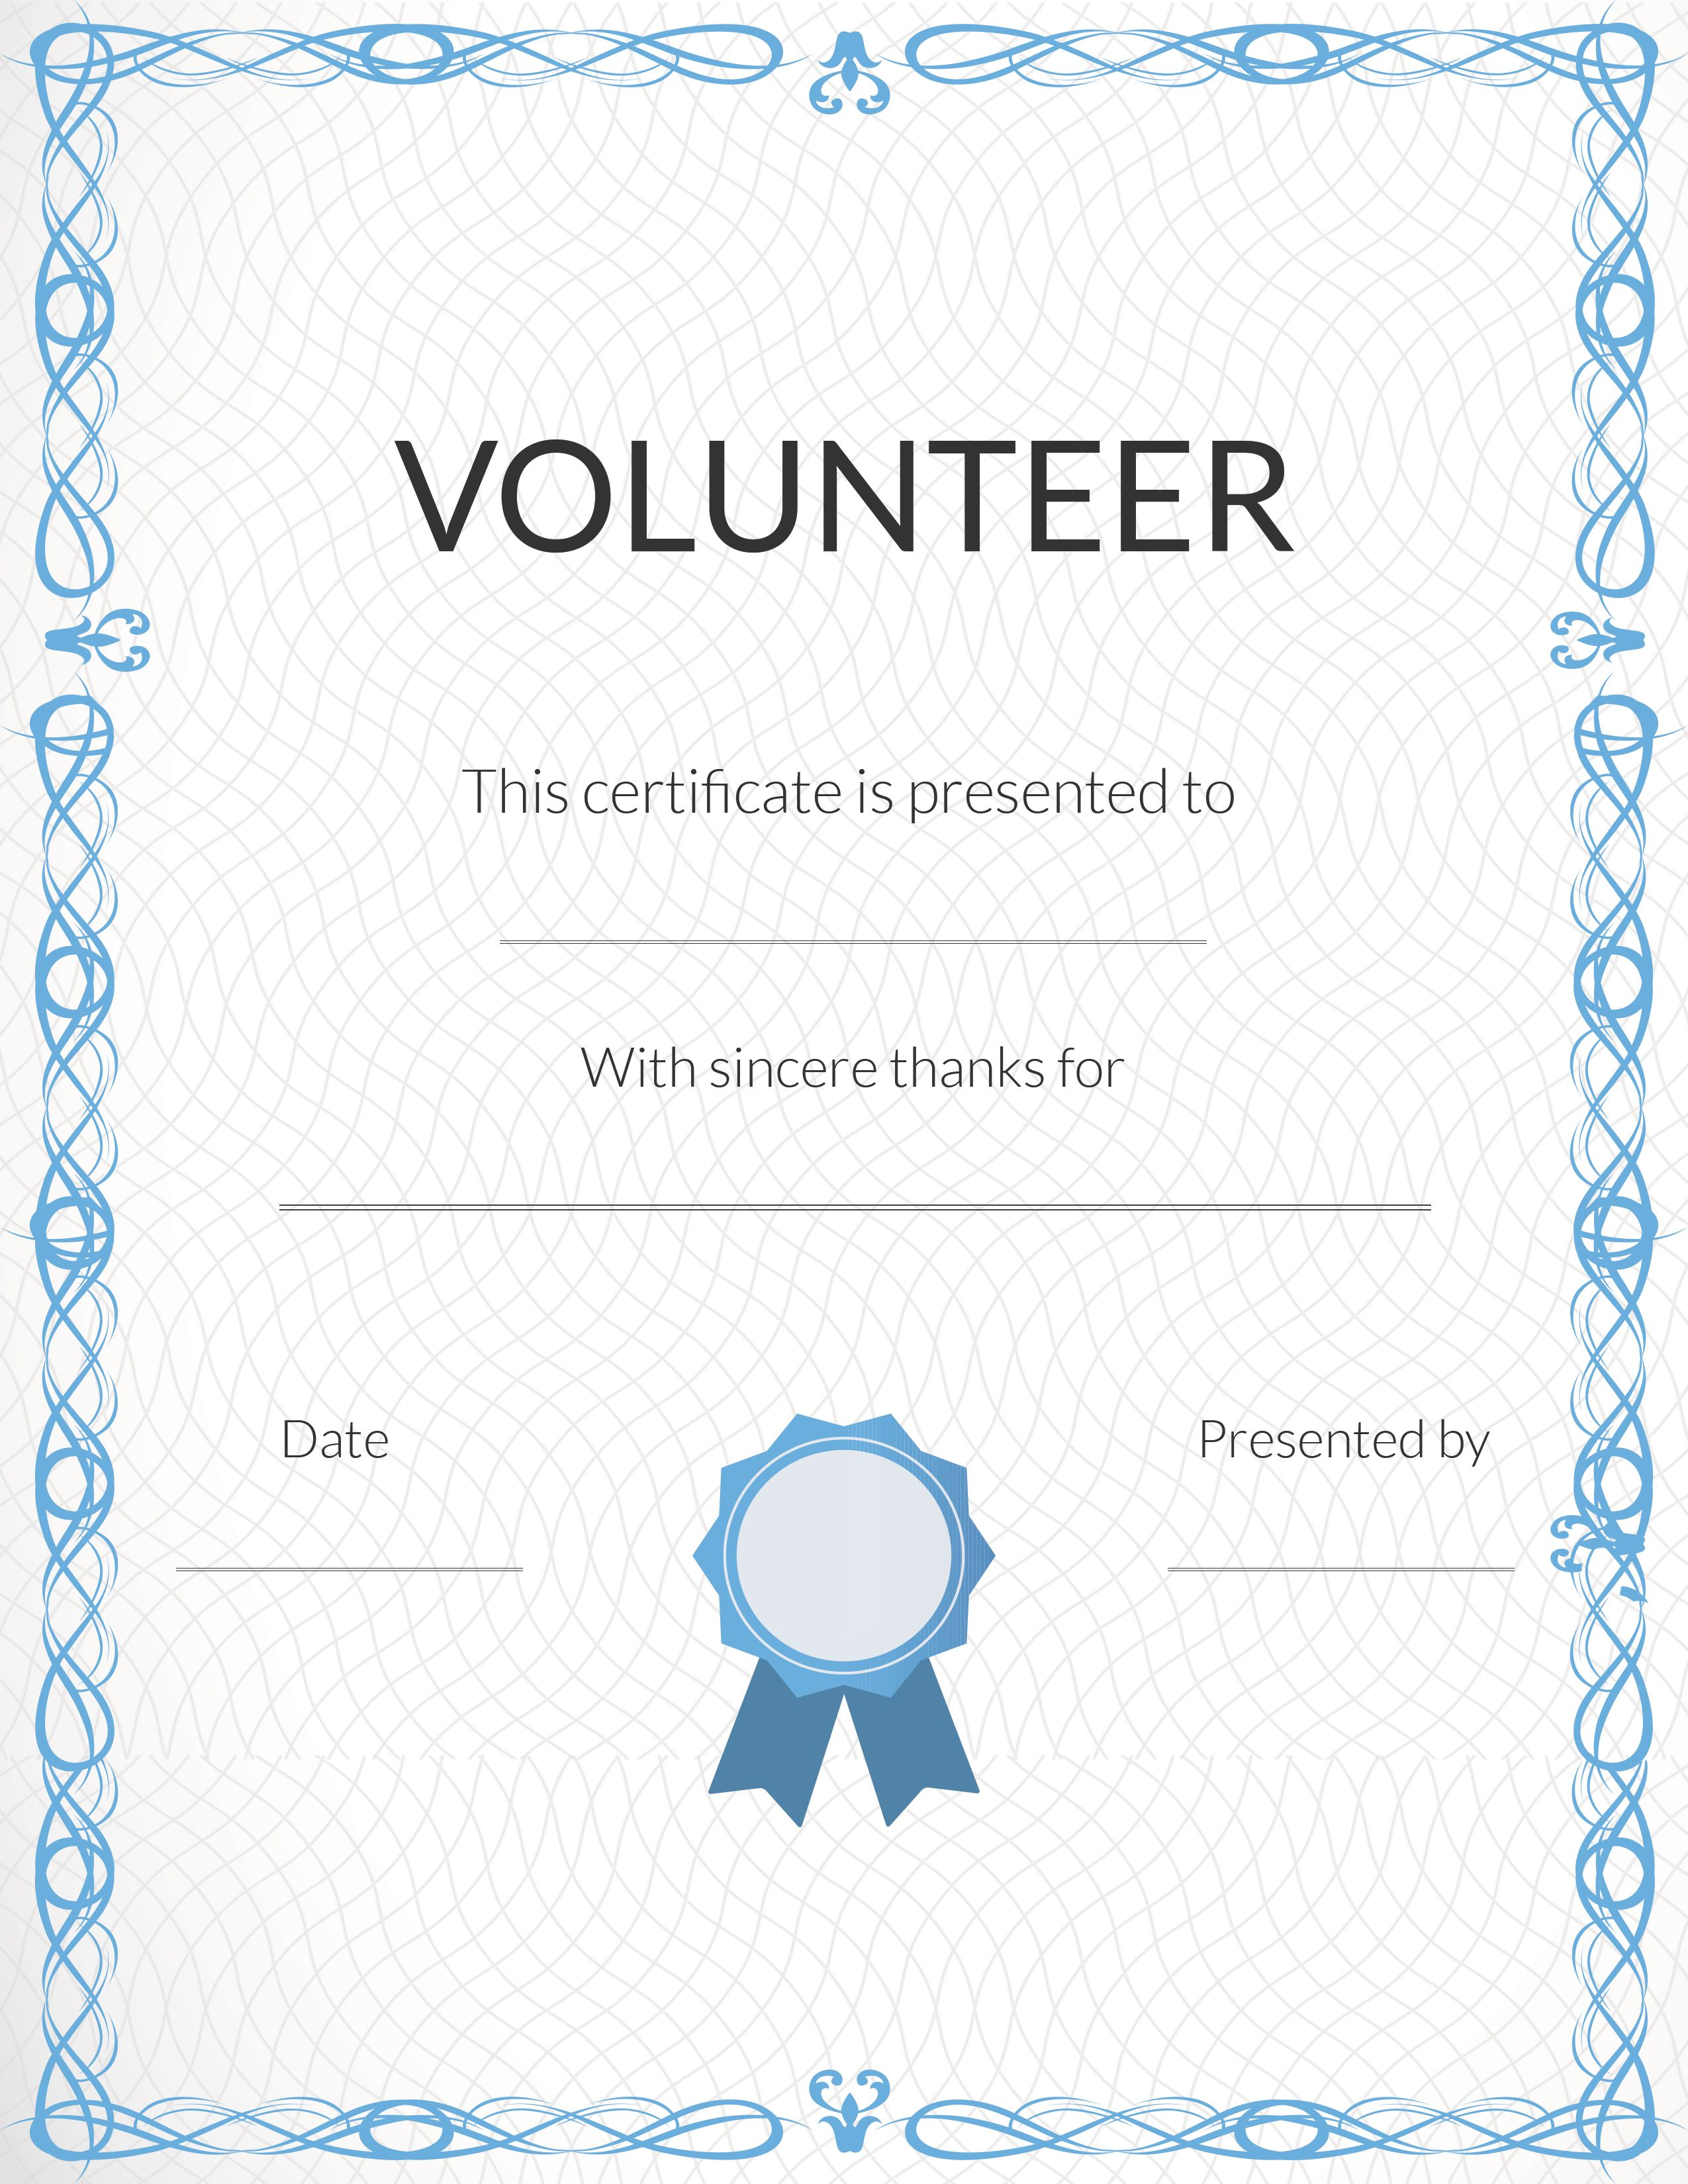 Volunteers Certificate Templates - FREE DOWNLOAD With Volunteer Certificate Templates